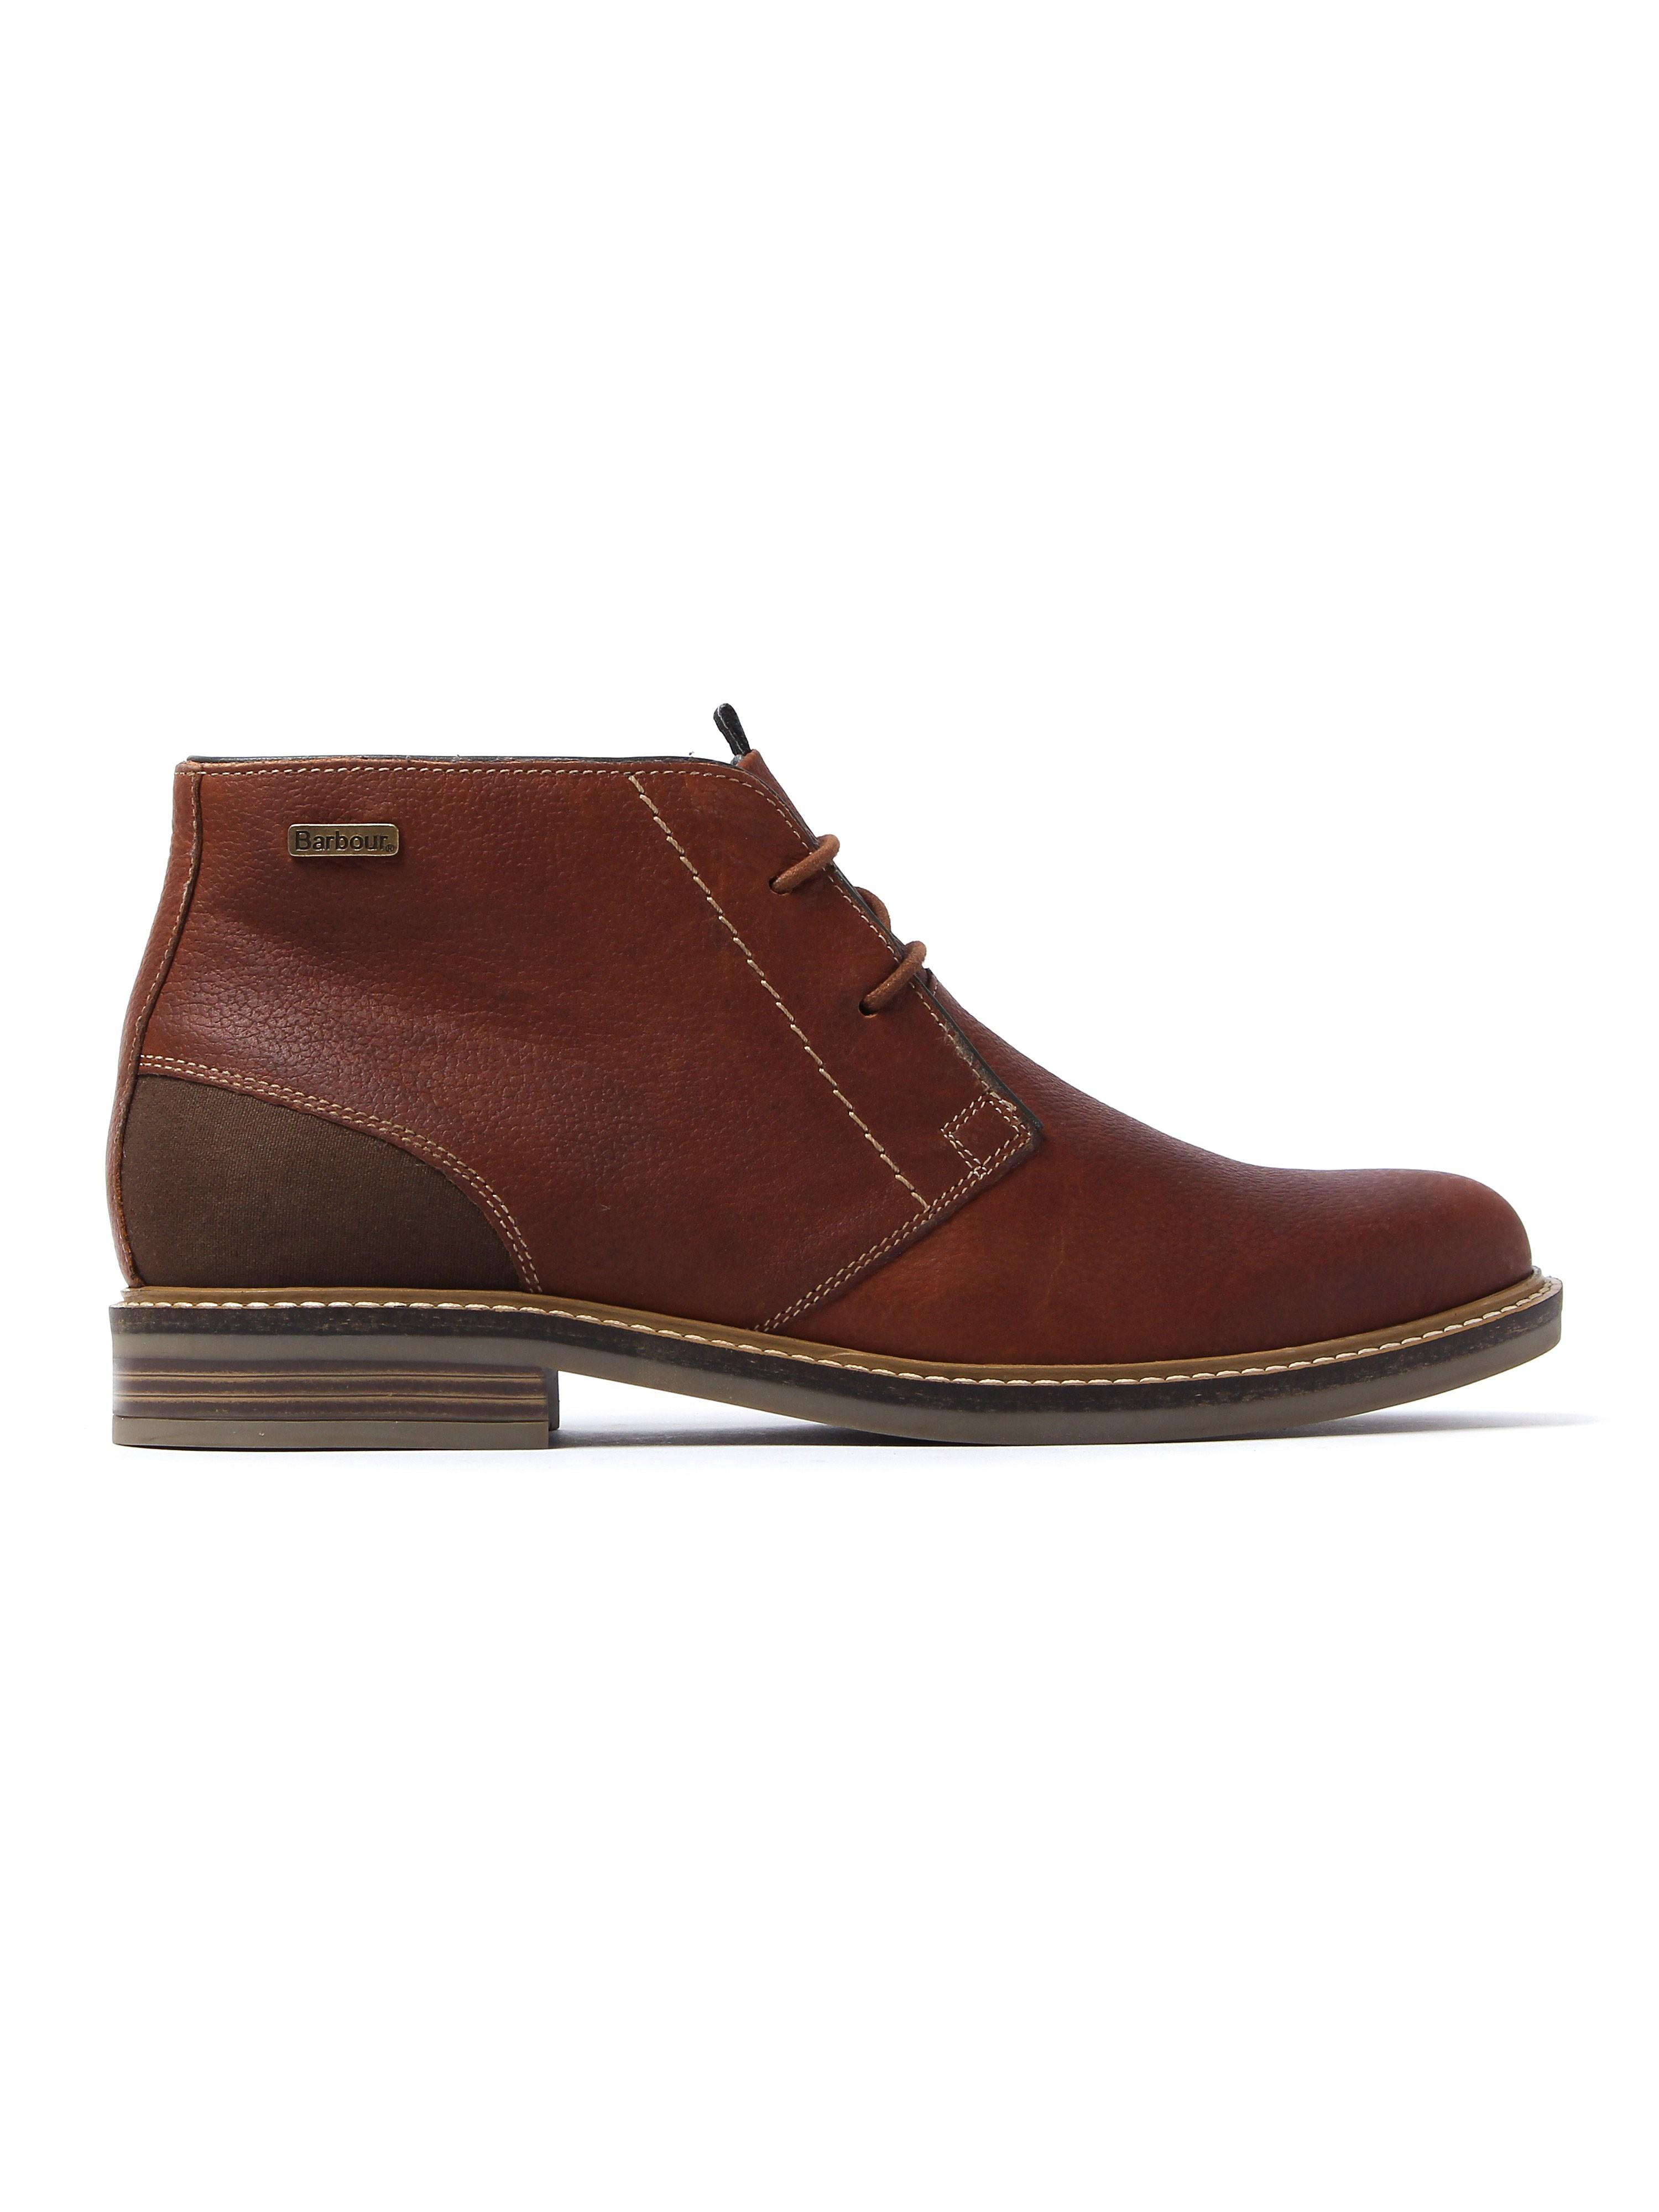 Barbour Men's Readhead Leather Chukka Boots - Chestnut